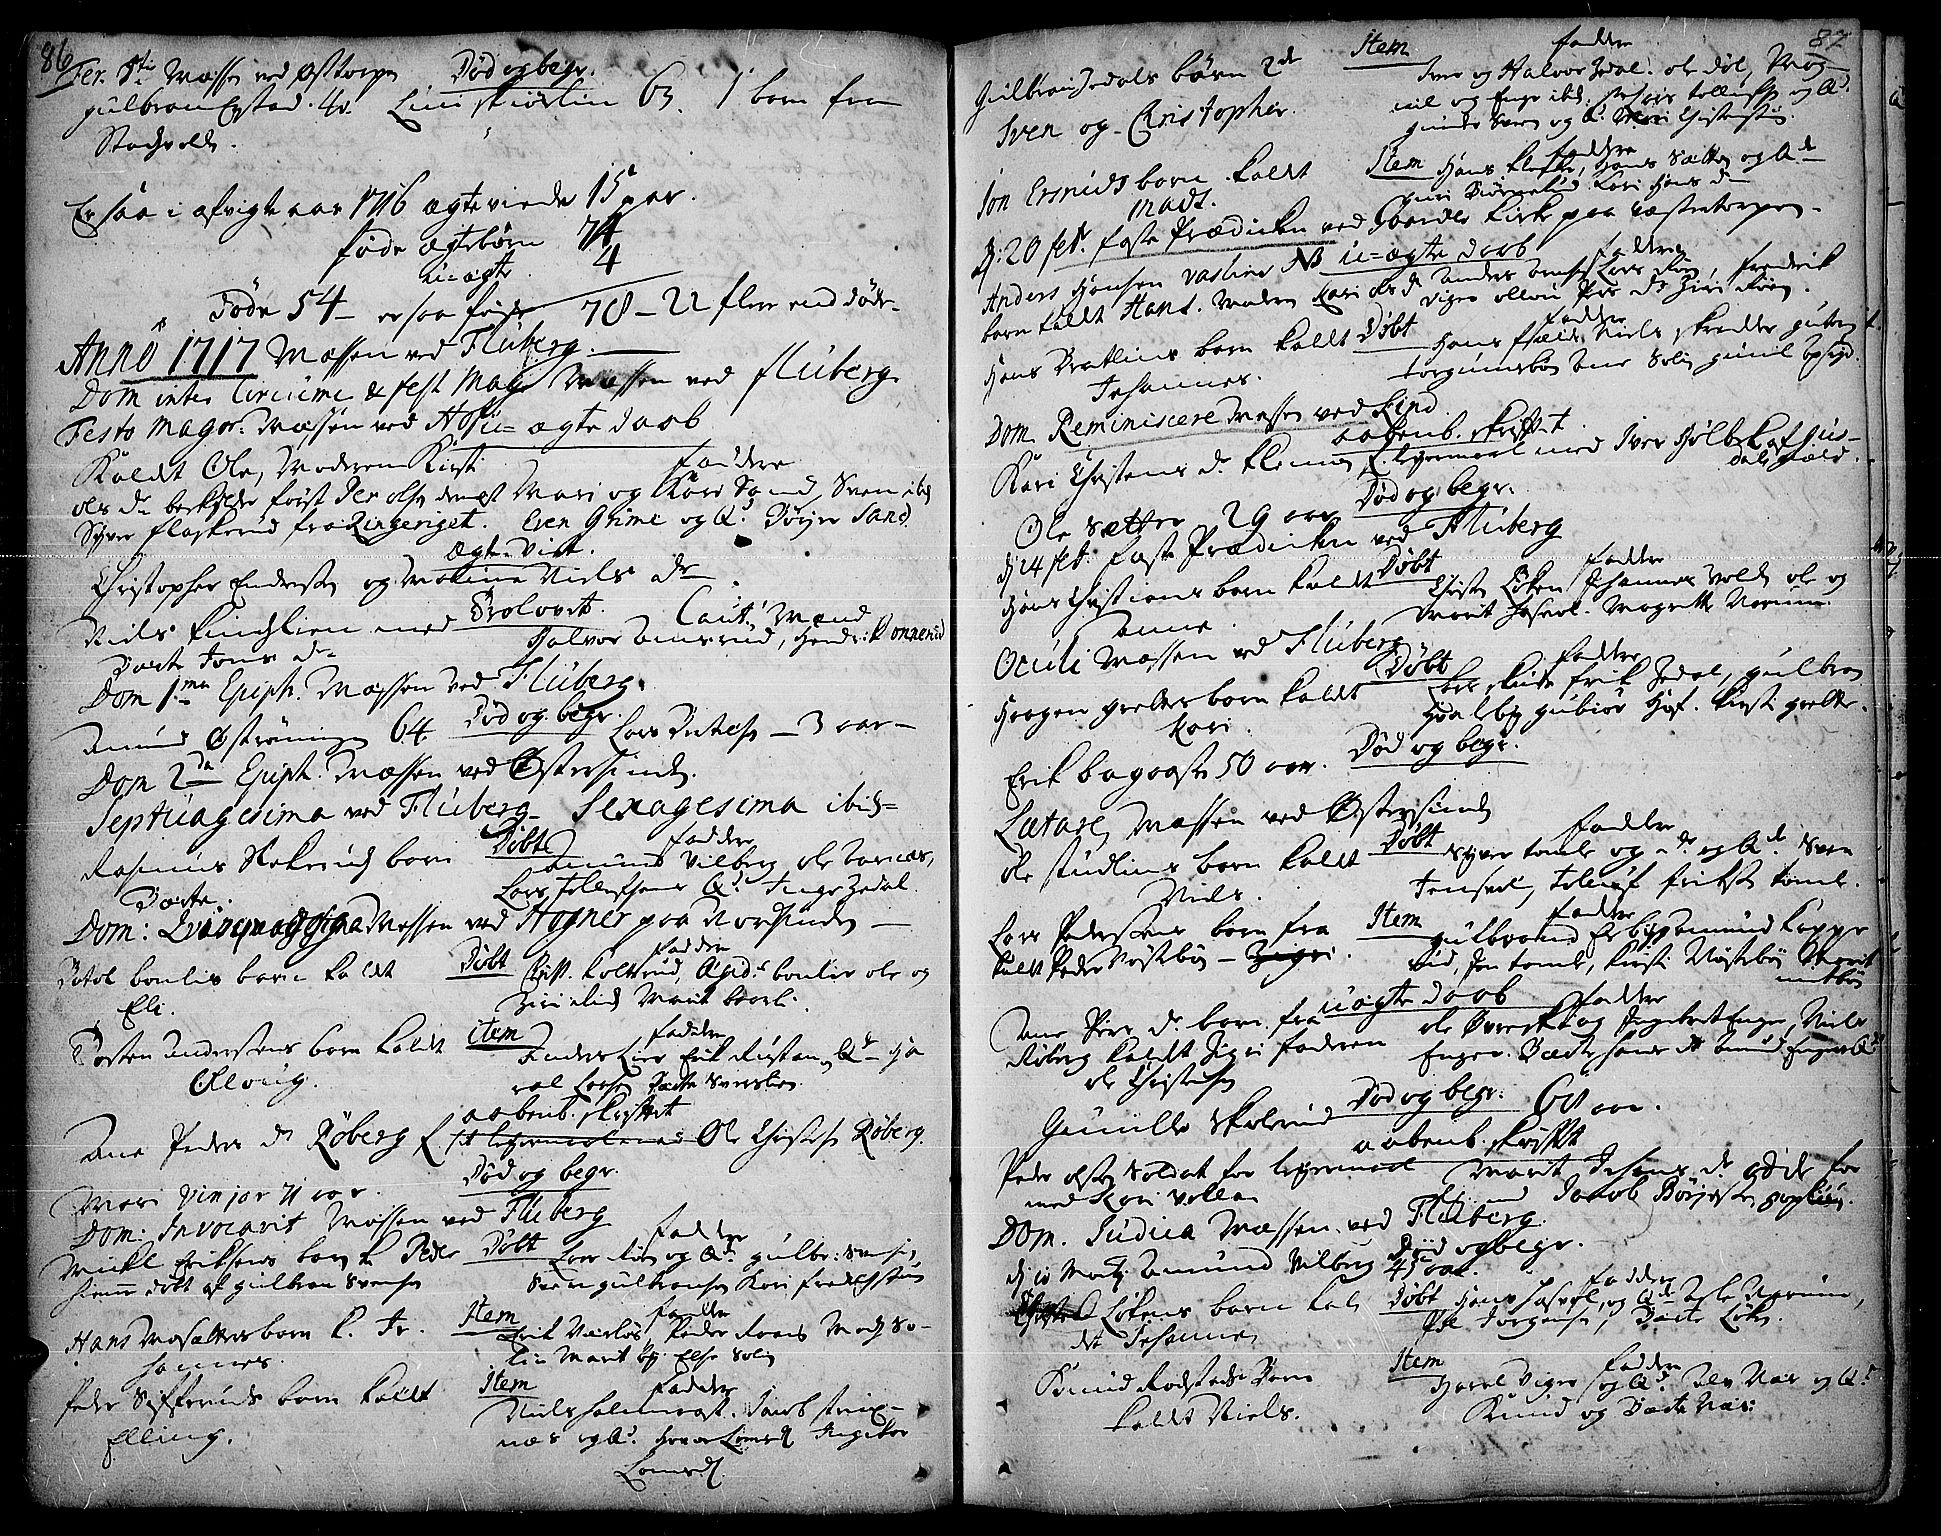 SAH, Land prestekontor, Ministerialbok nr. 1, 1708-1732, s. 86-87